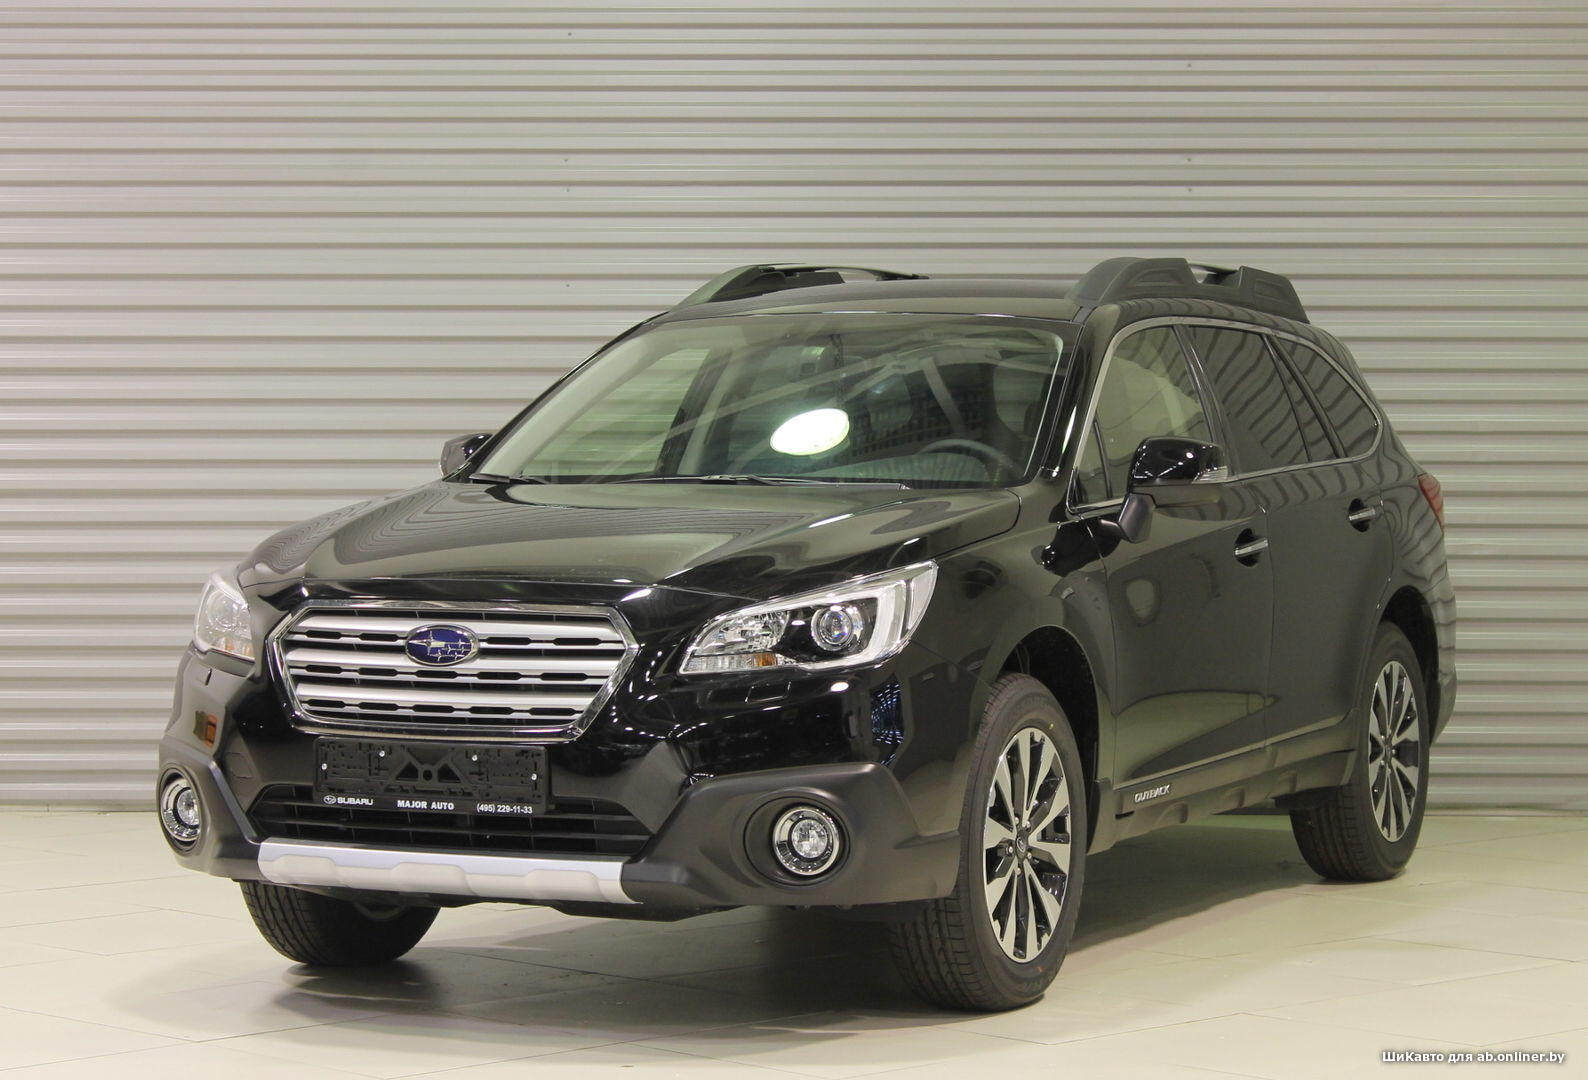 Subaru Outback 2.5i-S PREMIUM (ZW)